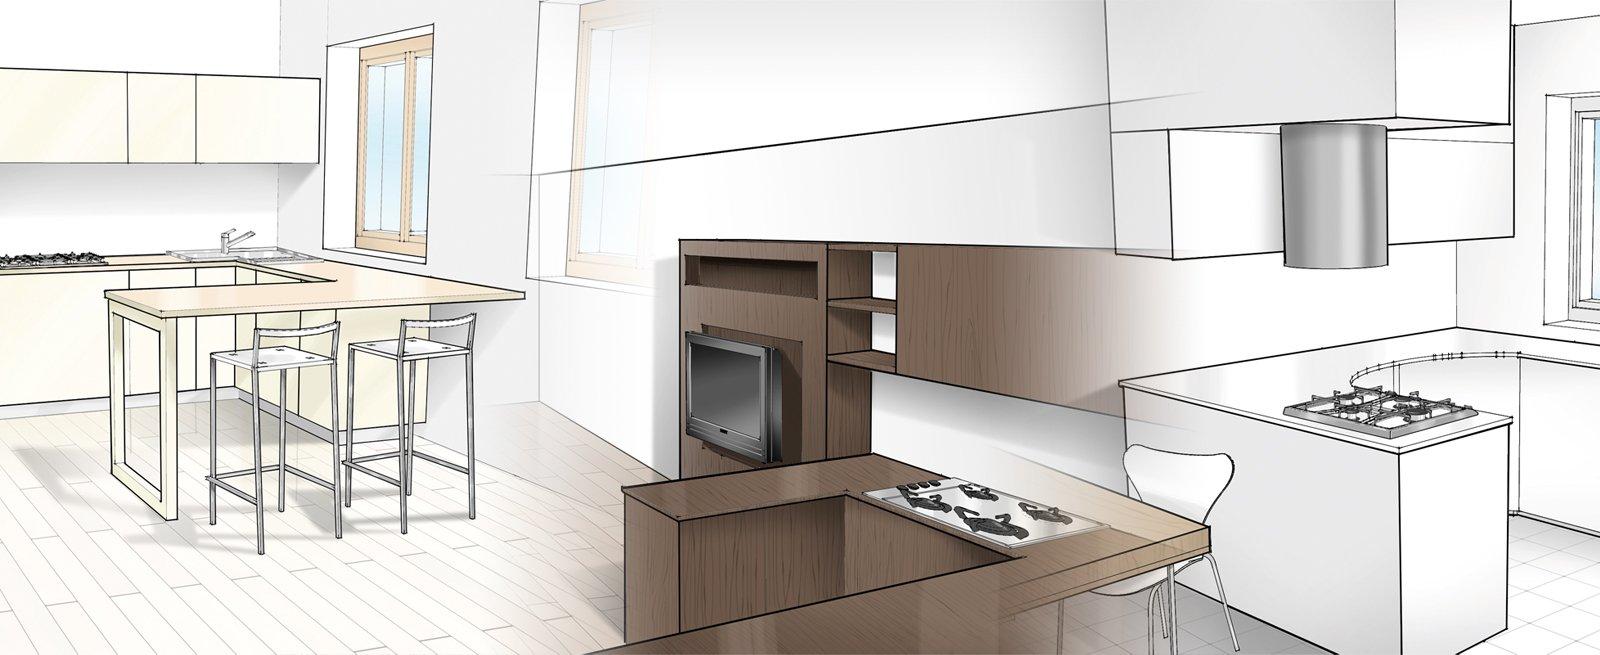 Tre soluzioni per una cucina cose di casa - Cucine sotto finestra ...